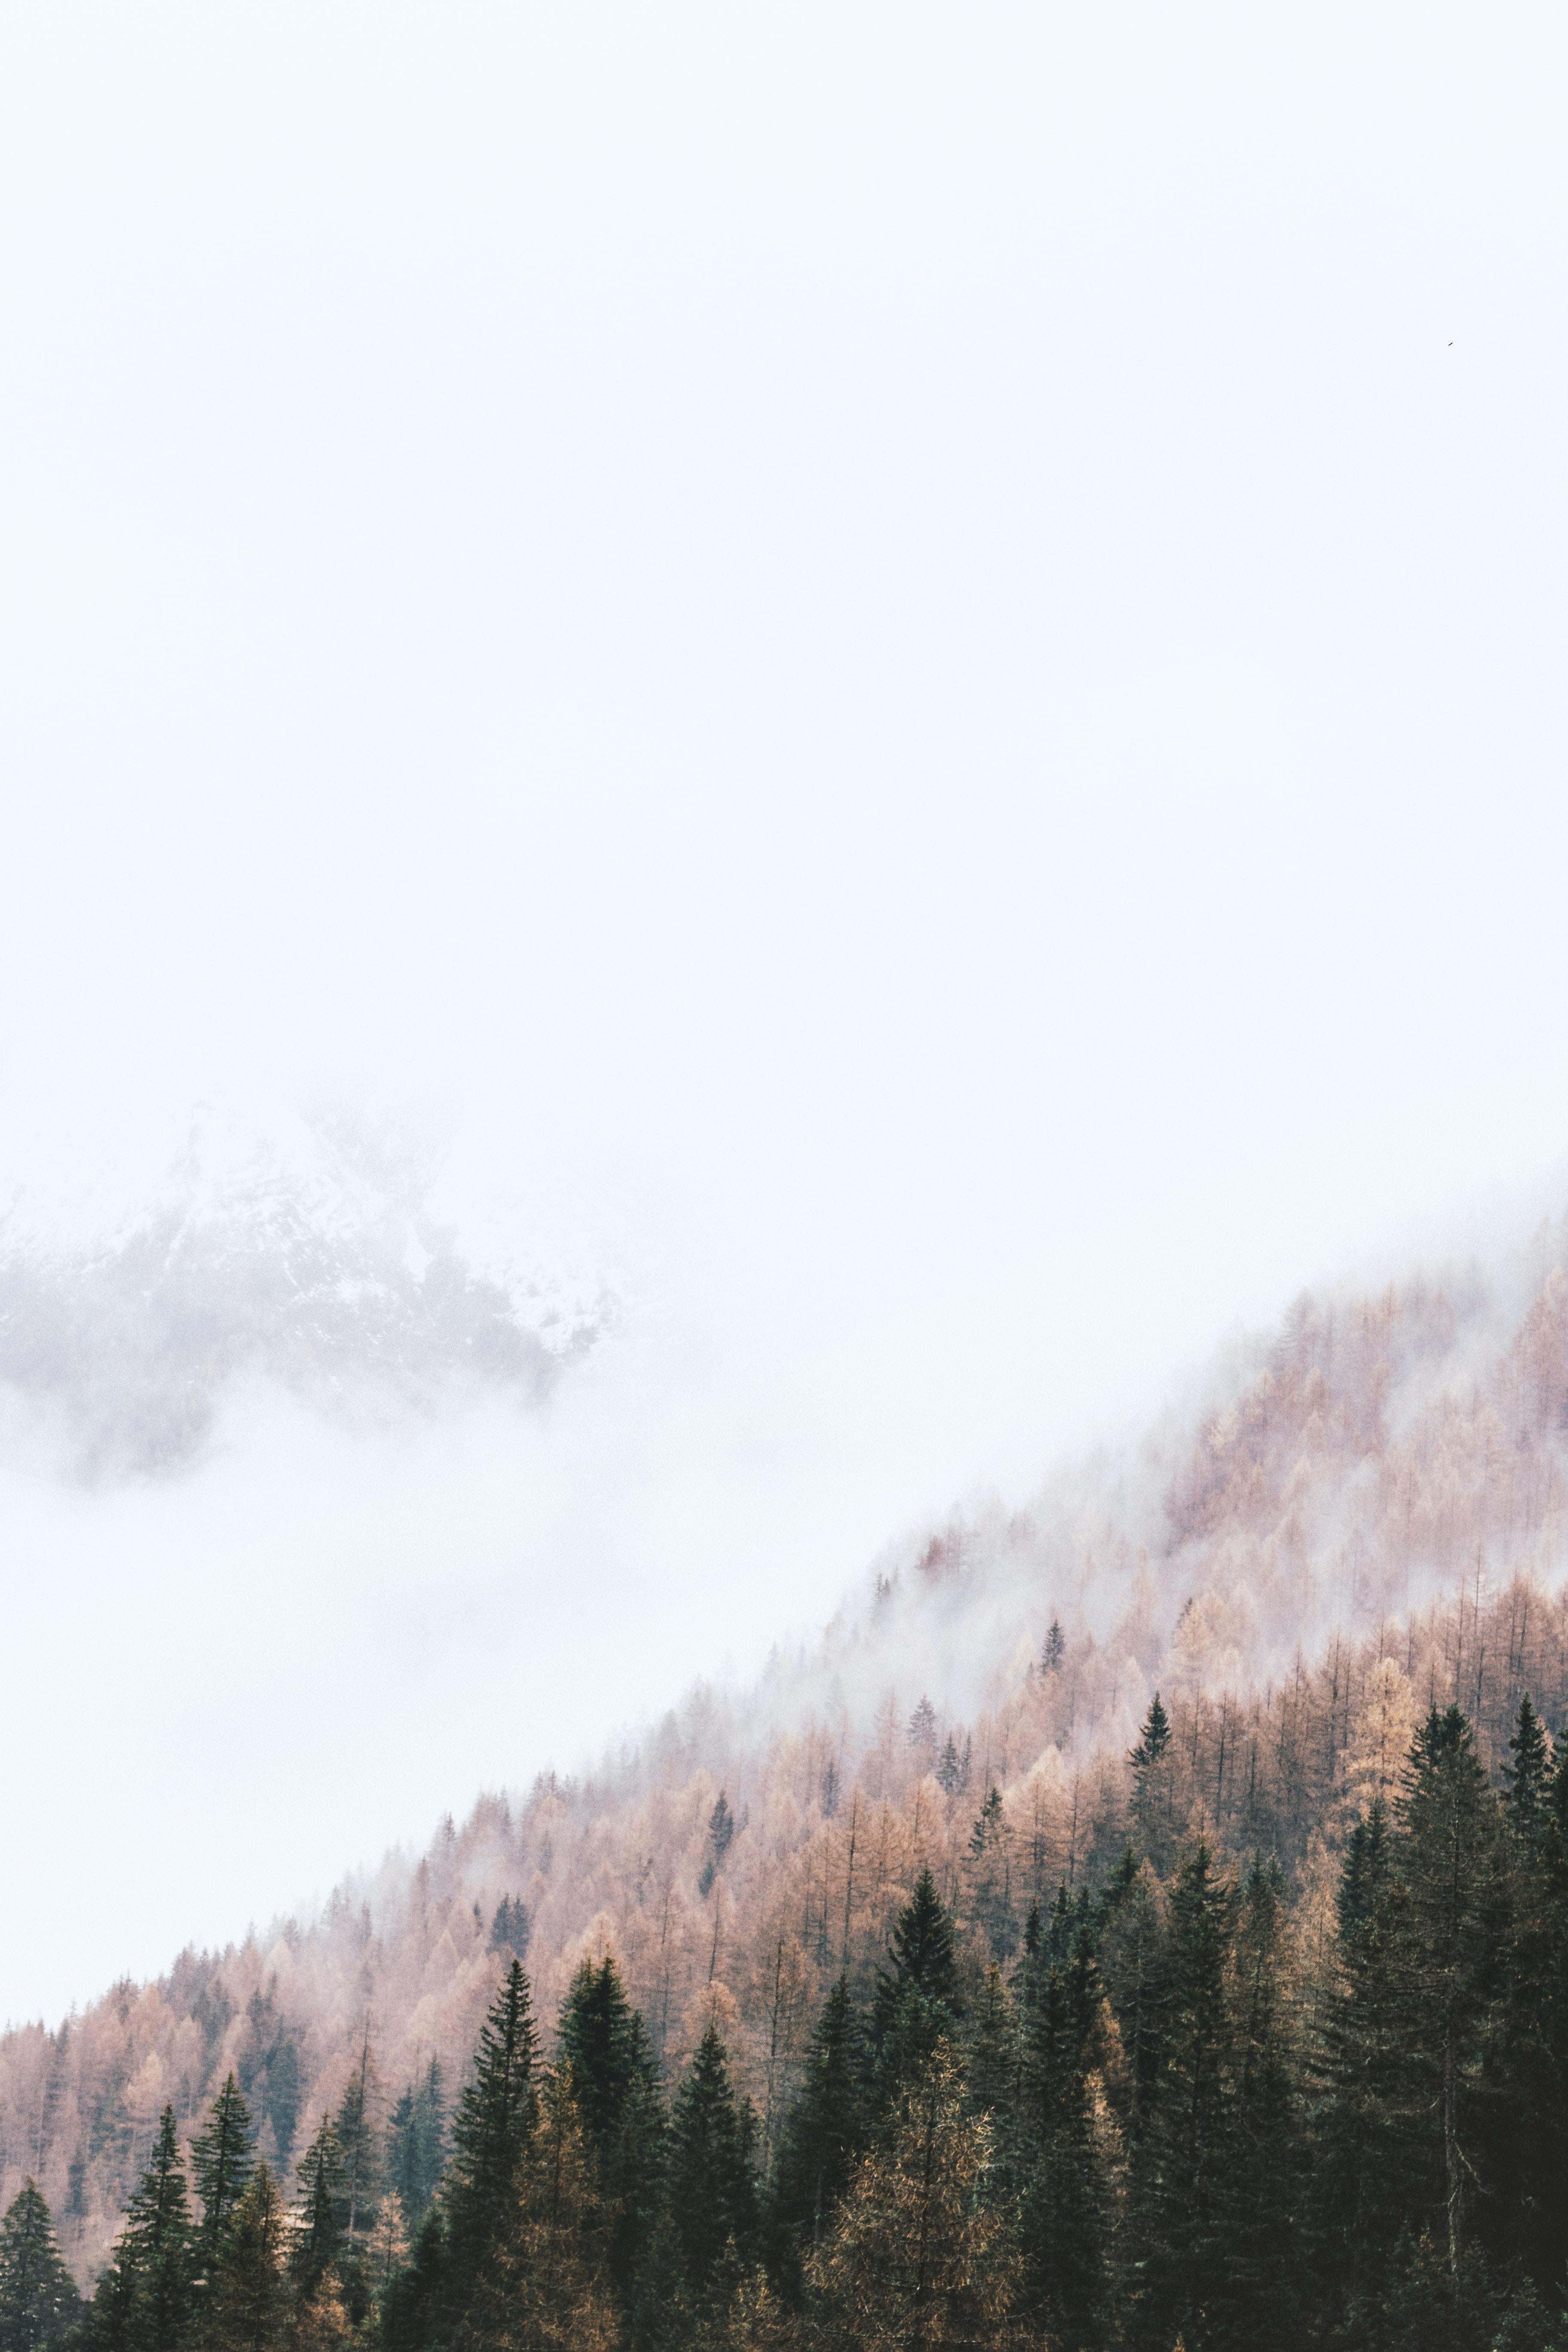 high-angle photography of pine trees